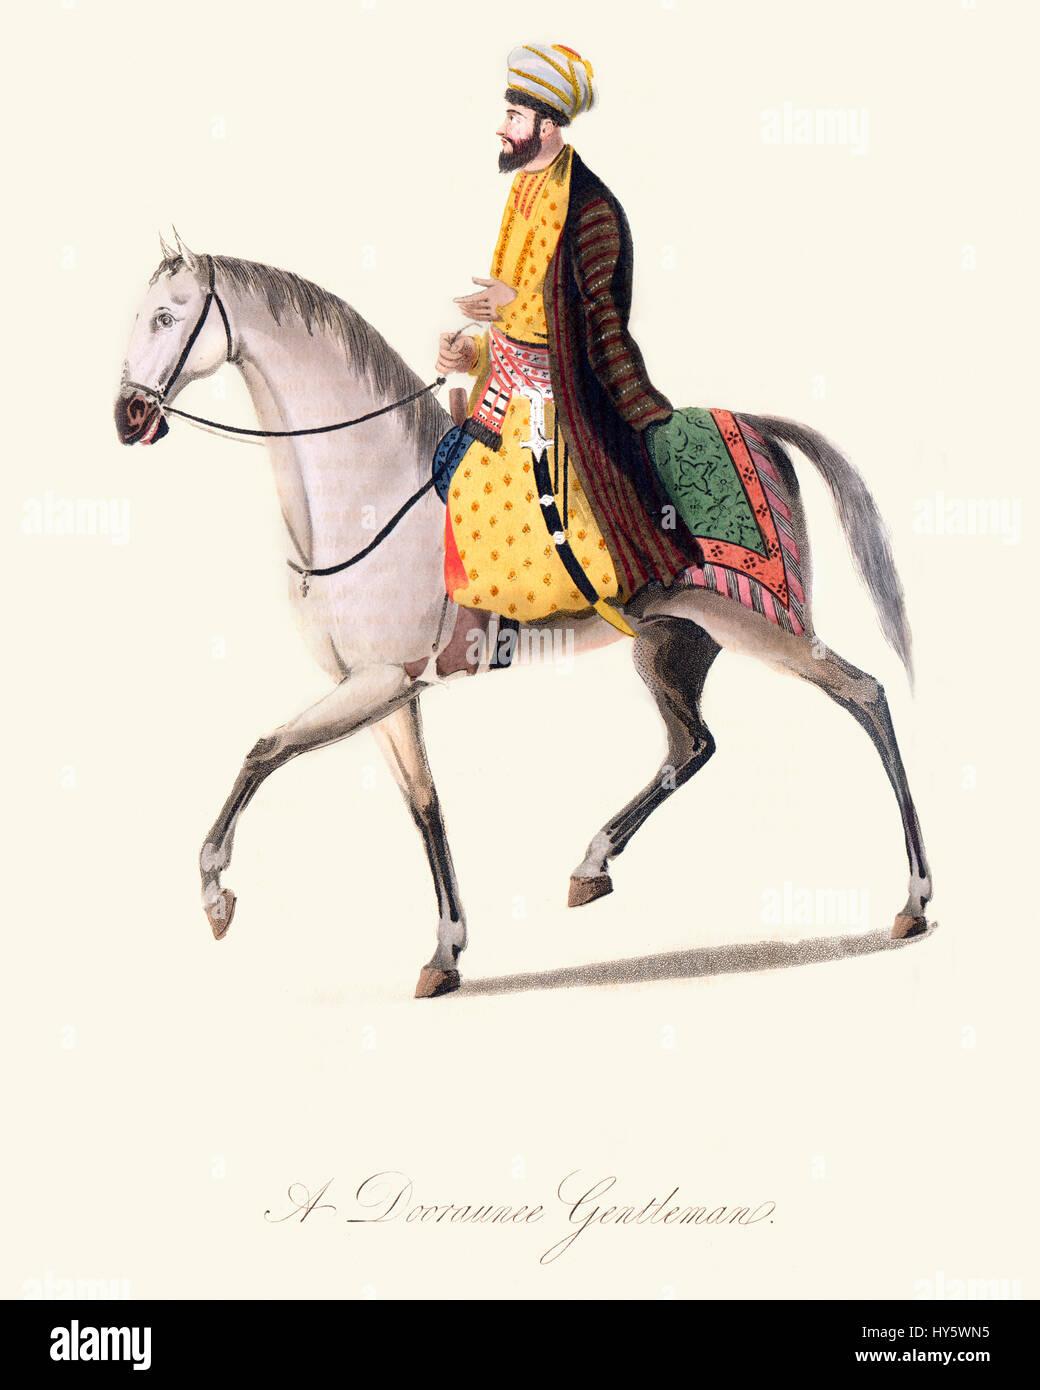 Vintage colour engraving from 1819 showing an Afghan Dooraunee Gentleman on horseback - Stock Image